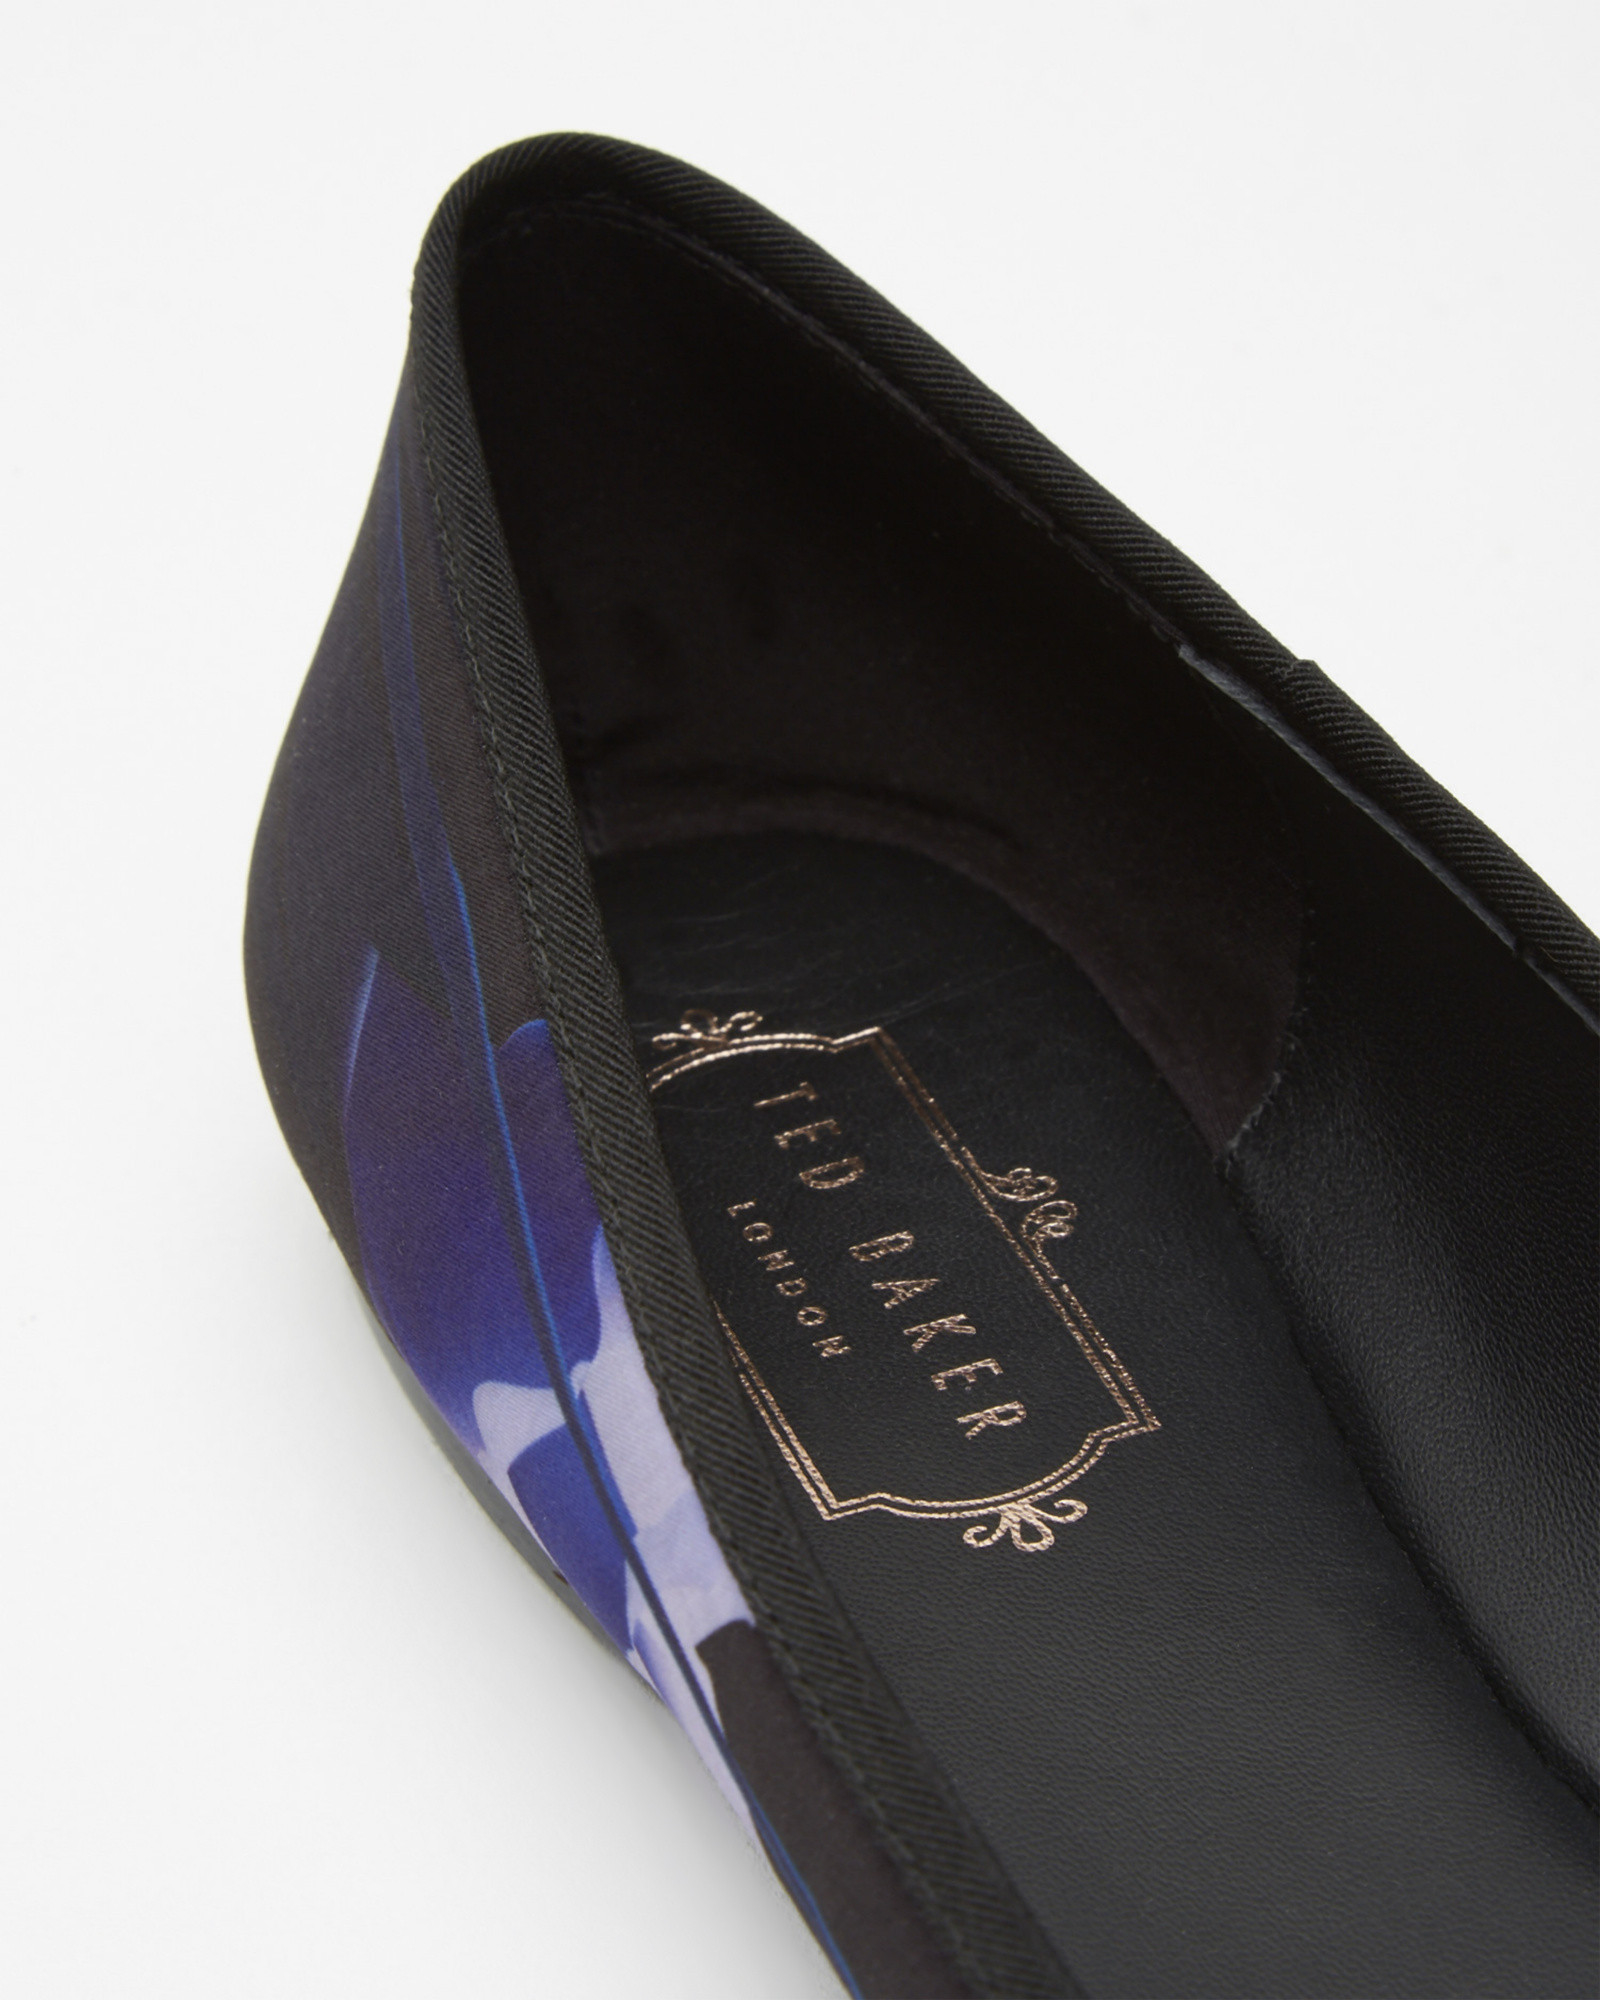 3e3195773 Ted Baker Bow Detail Ballerina Pumps - Lyst